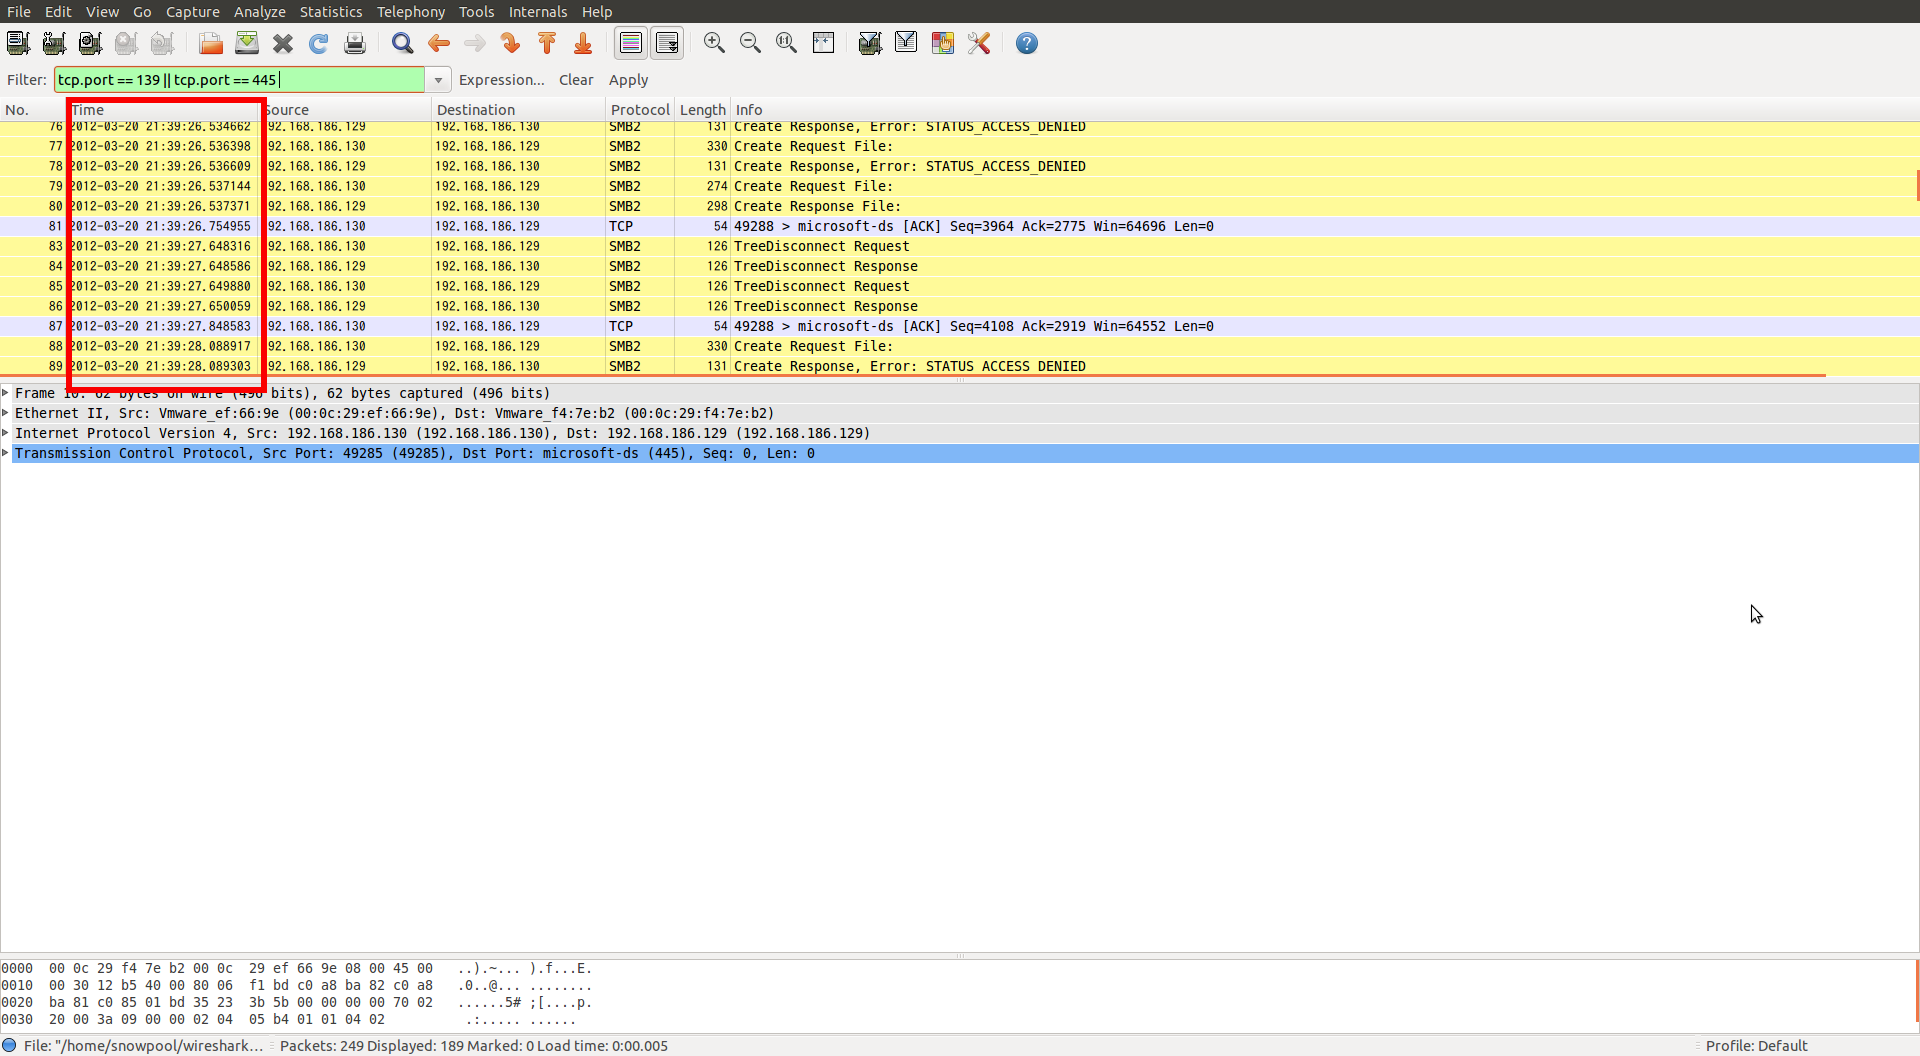 Screenshot-2012-04-20 20:42:23